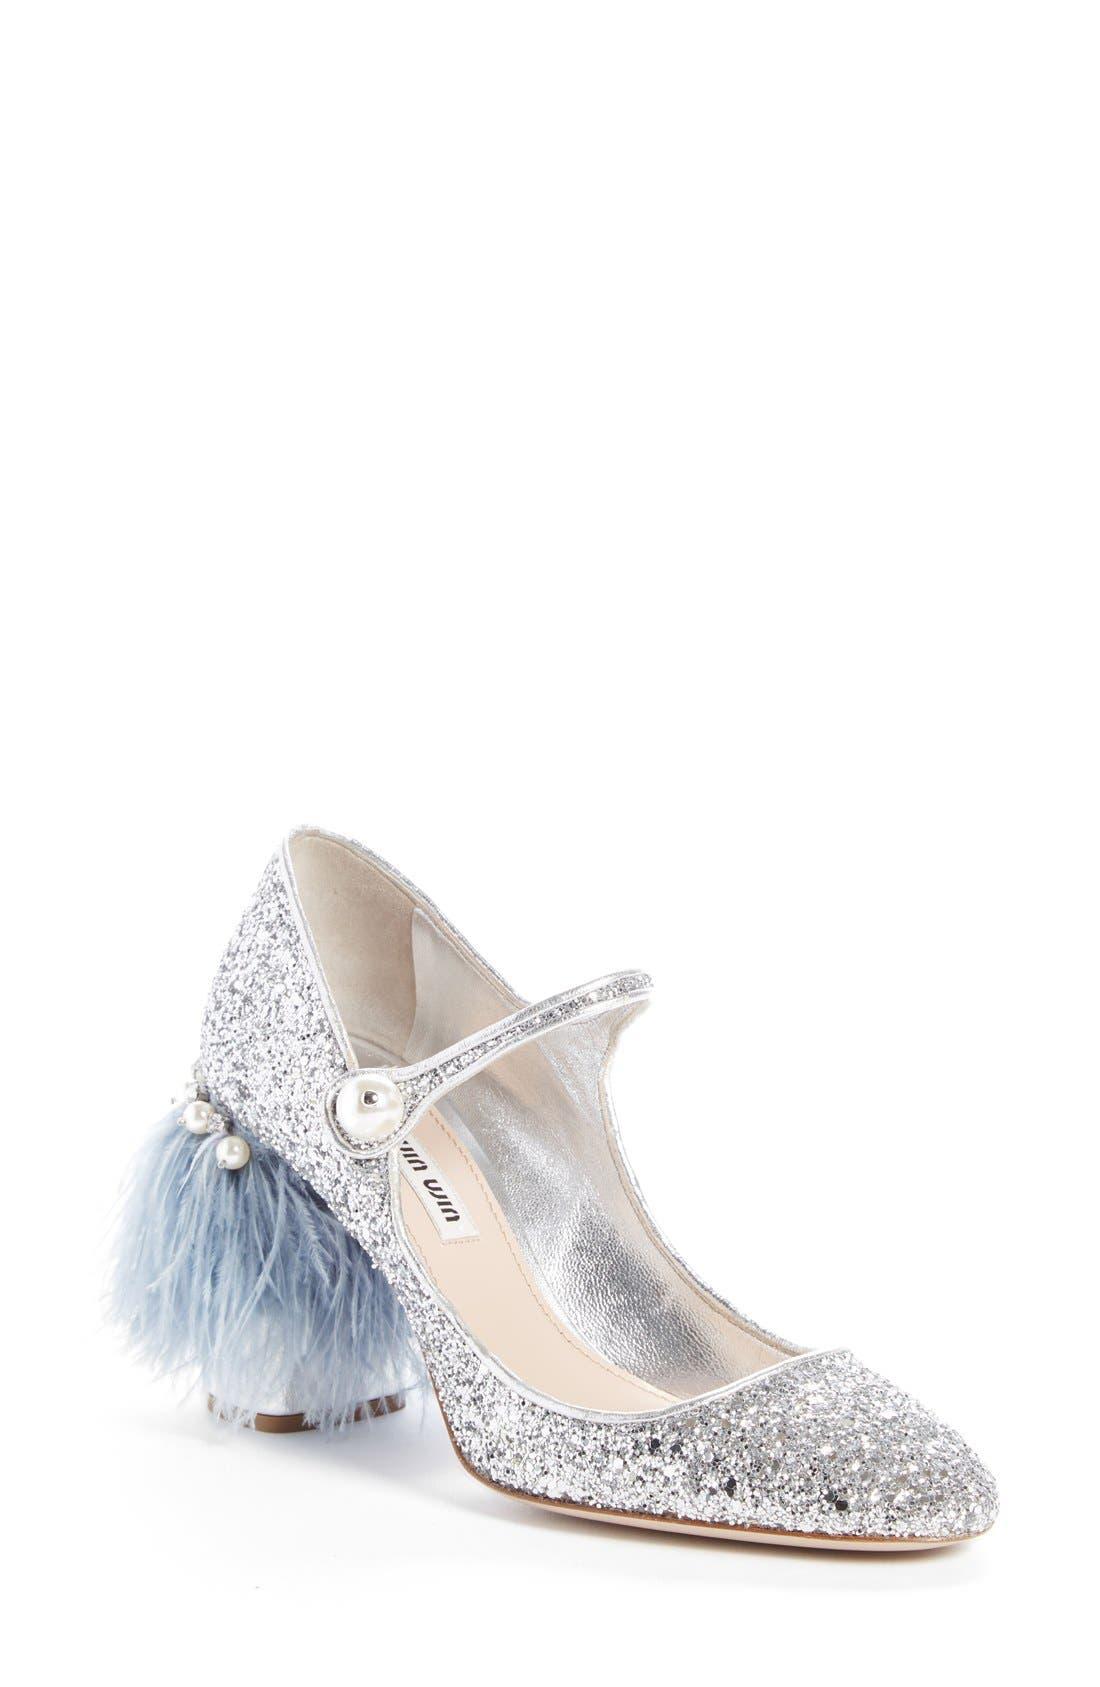 Main Image - Miu Miu Feather Block Heel Mary Jane Pump (Women)